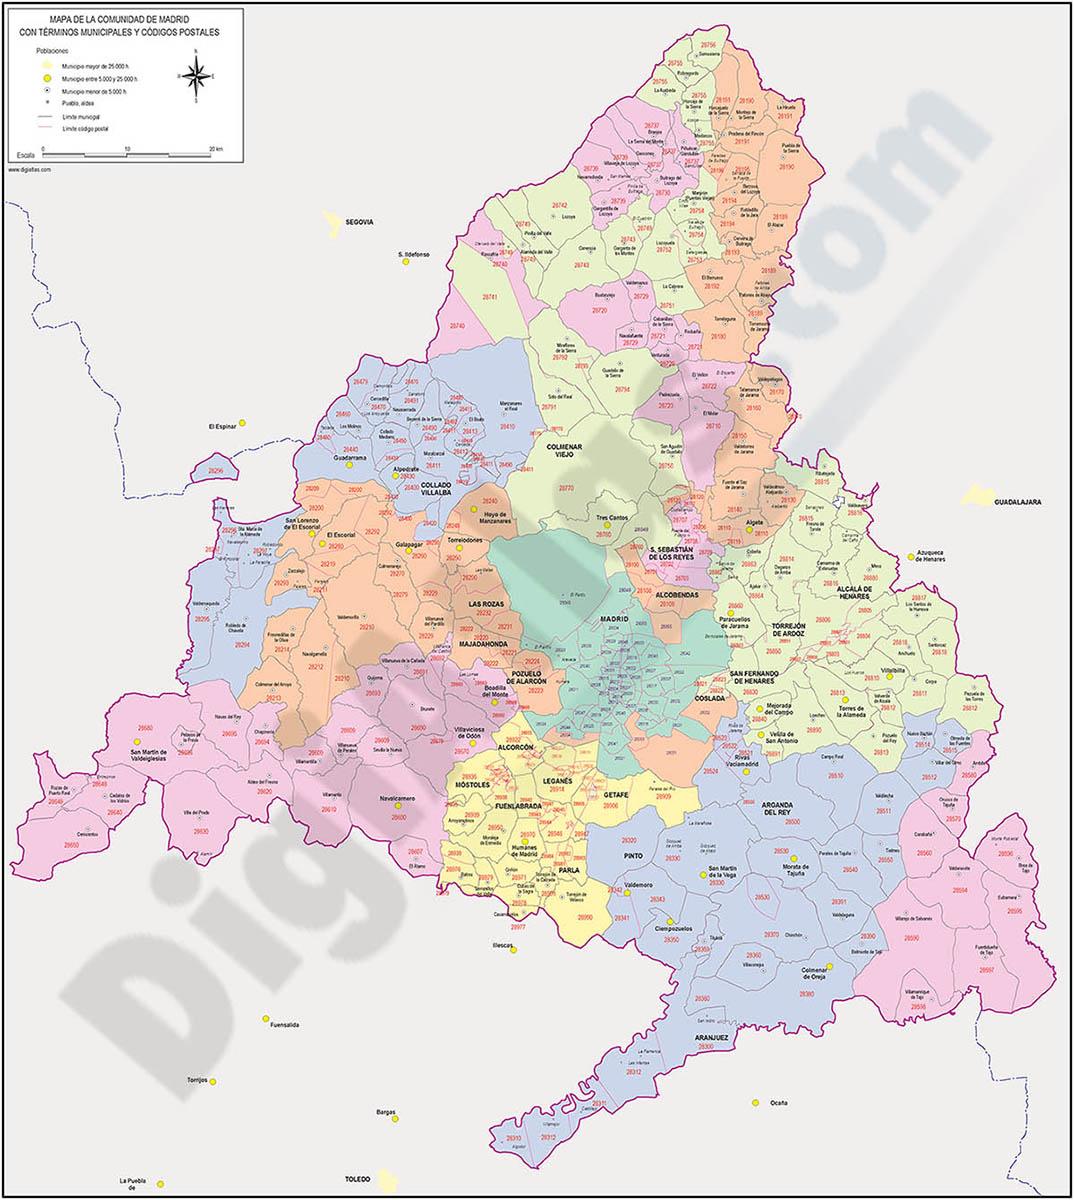 Map of Madrid autonomous community, municipalities and postal codes color